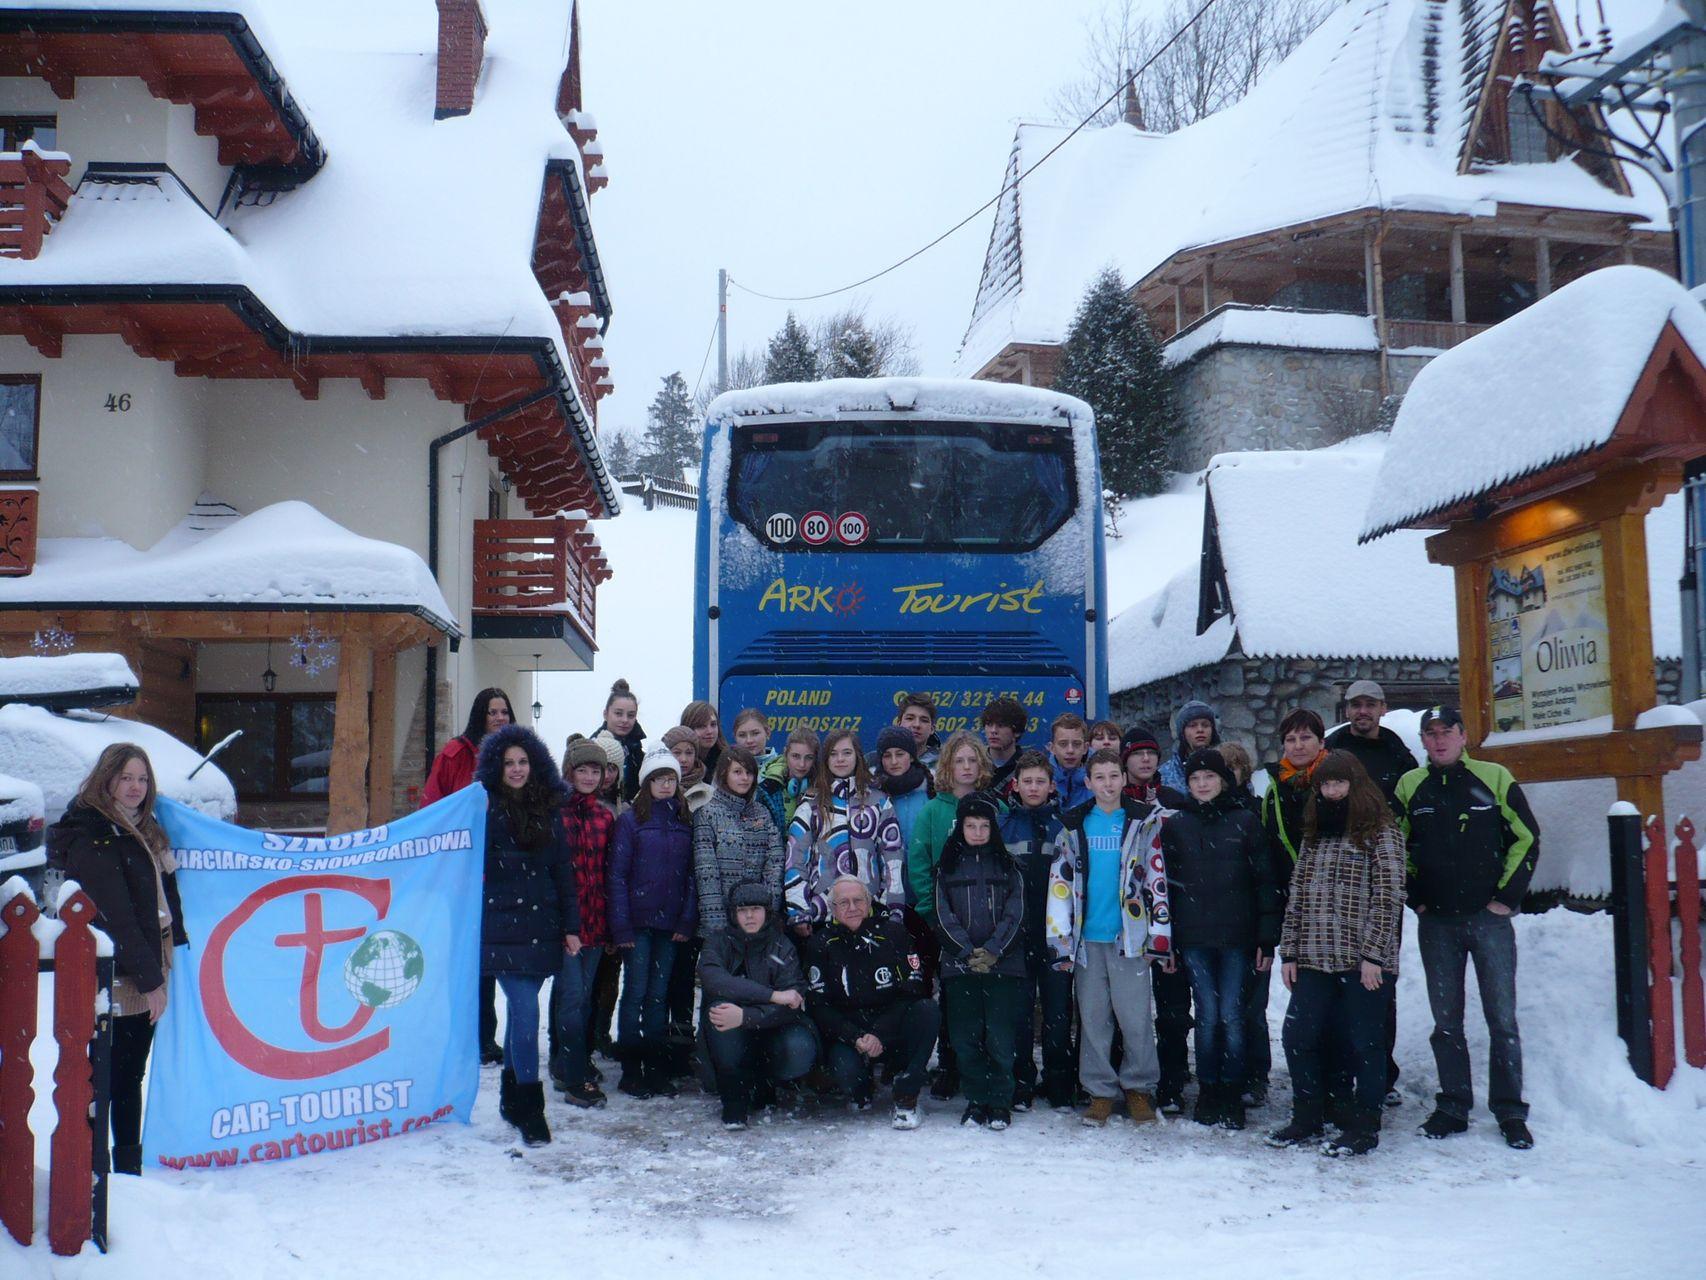 CarTourist_narty-snowboard_2012-foto-33